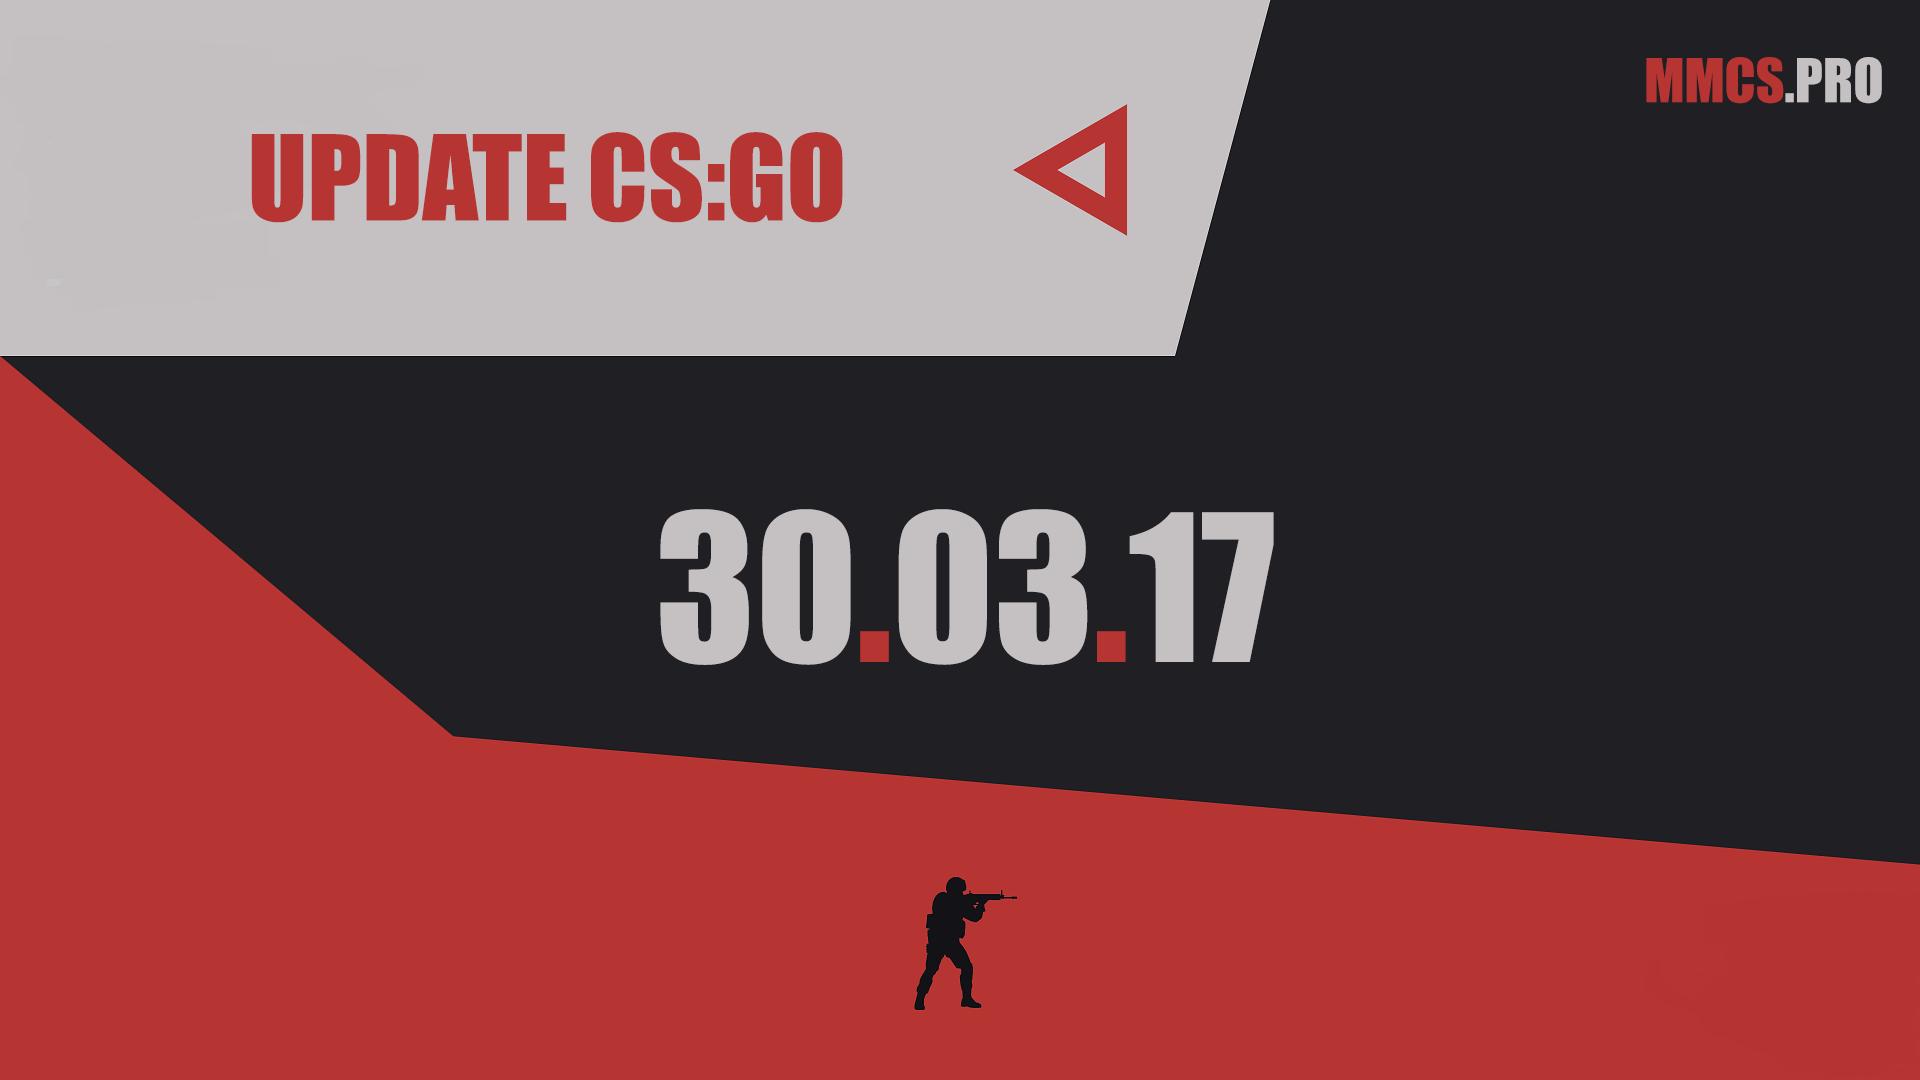 https://mmcs.pro/update-csgo-30-03-2017-valve/